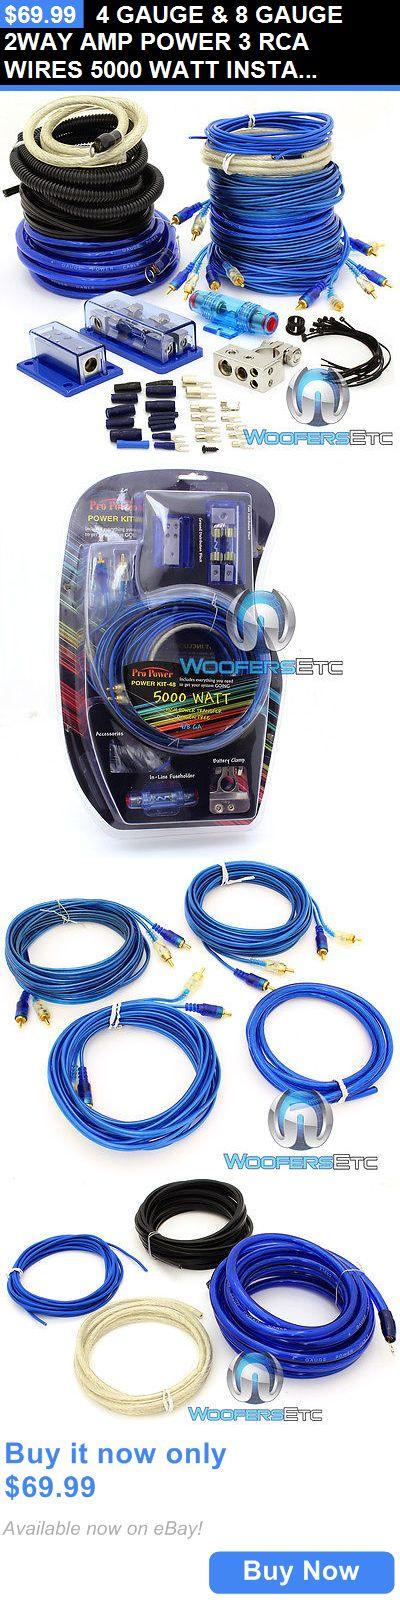 8 Gauge 3 Wire Cable - Dolgular.com